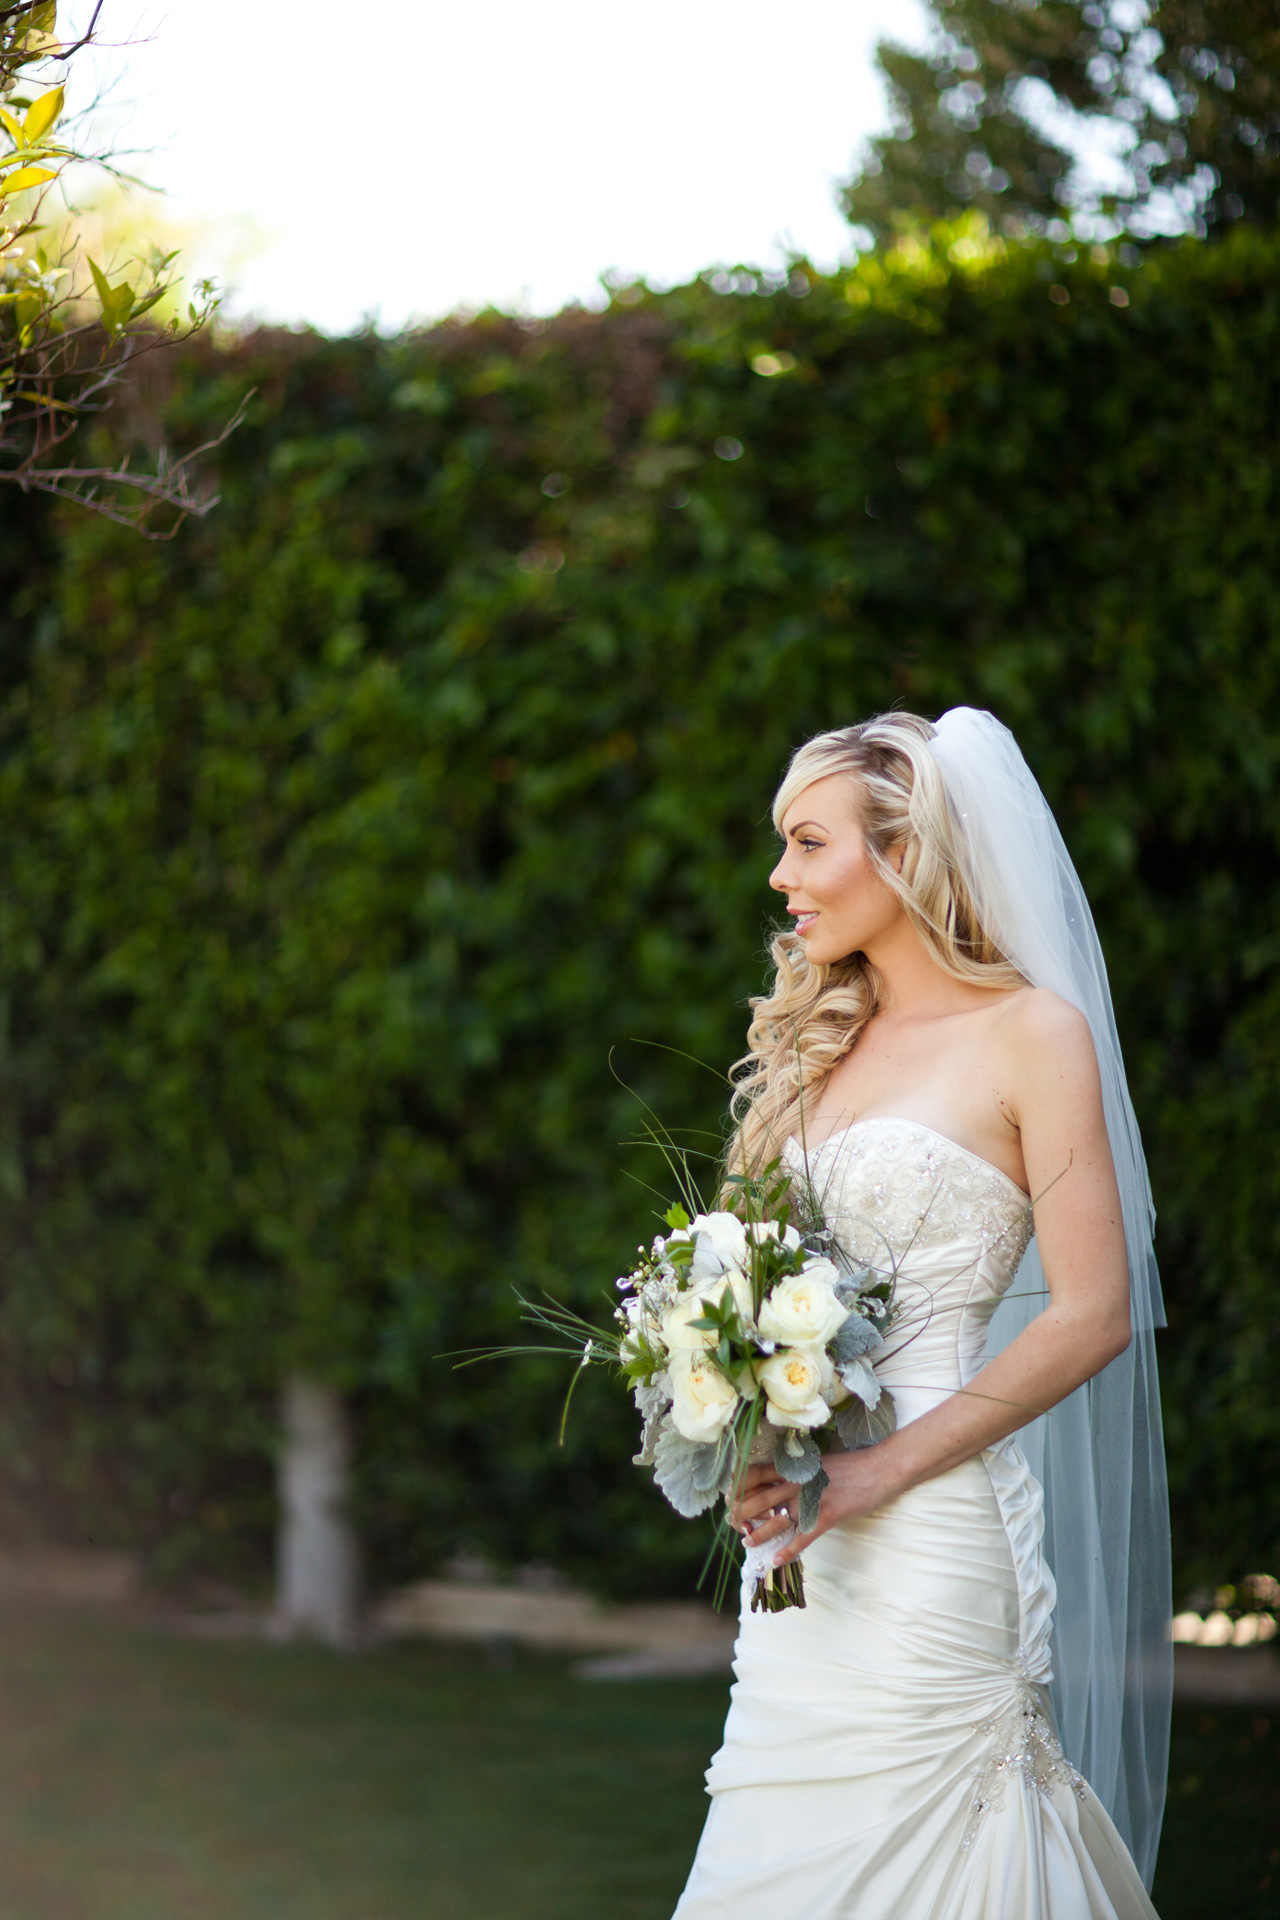 bride-portrait-004.jpg